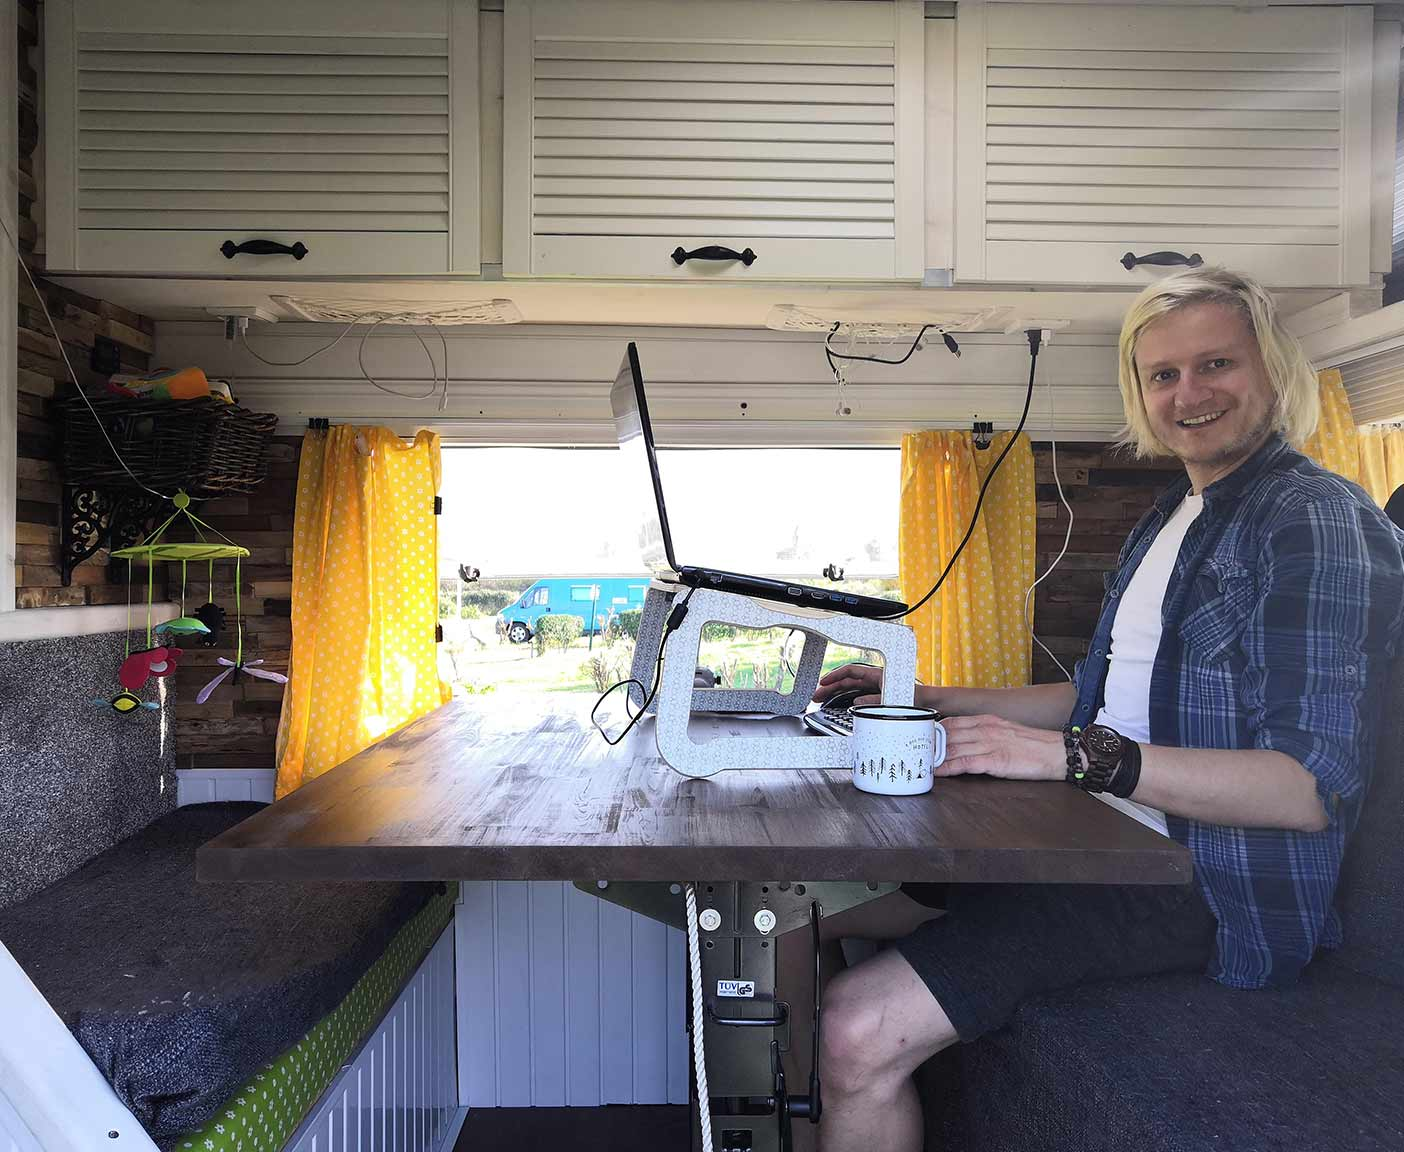 LT-28-VW-Florida-westfalia-pärchen-urlaub-innenausbau-kühlschrank-sitzbank-arbeiten-wohnmobil